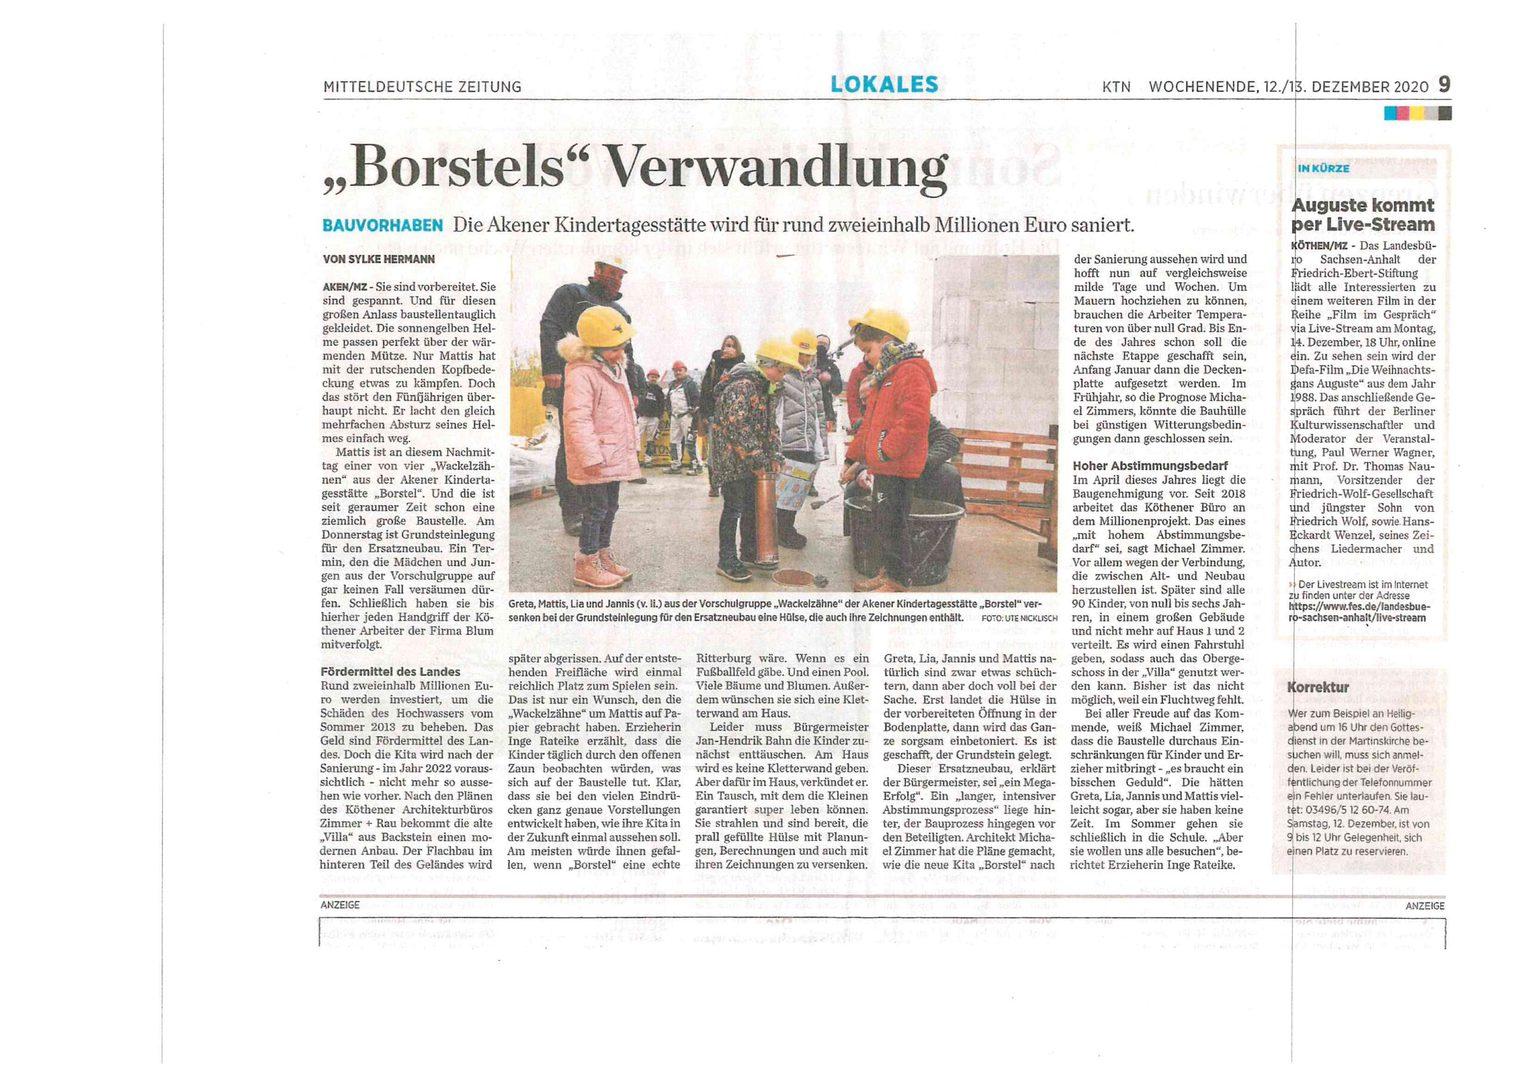 20201212_Kita Borstel Grundsteinlegung